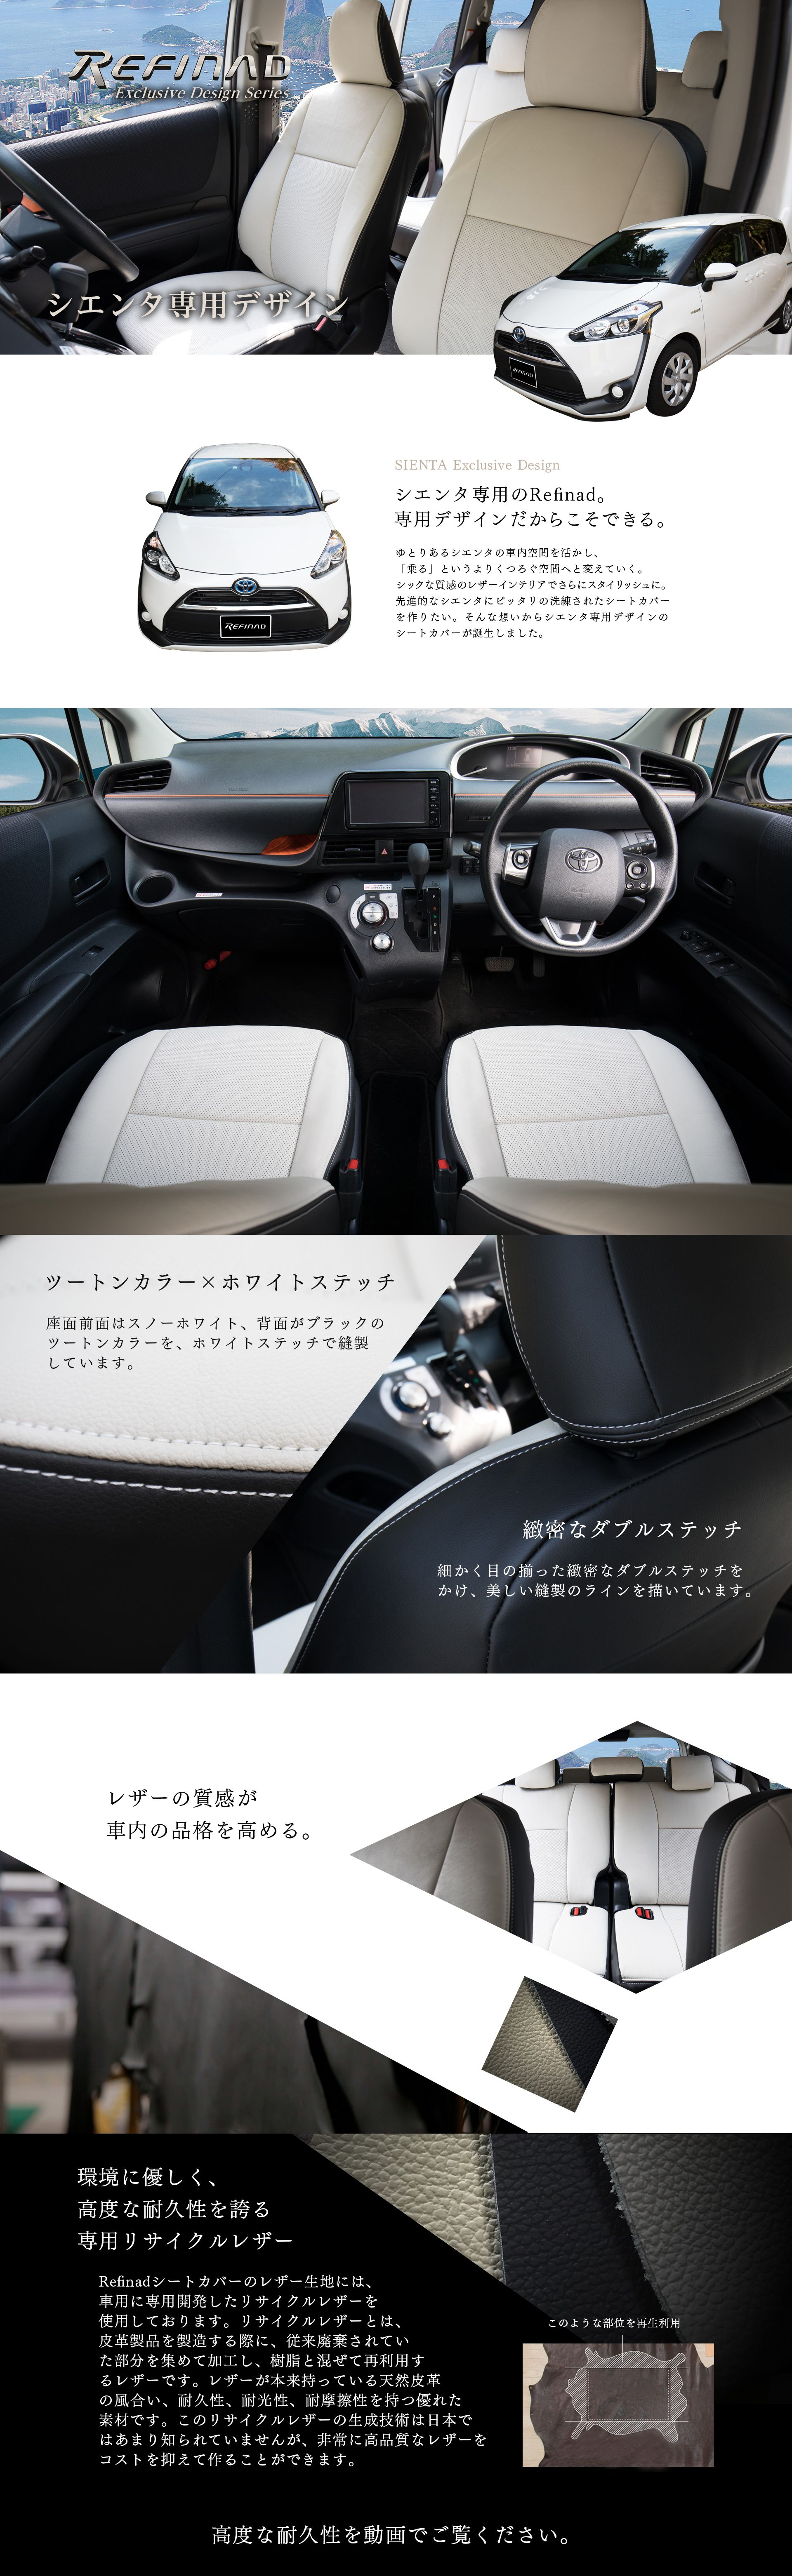 Refinad Exclusive Design Serires シエンタ専用デザイン Refinadだからできる。シエンタ車内がはえるホワイトとブラックのツートンカラーデザイン